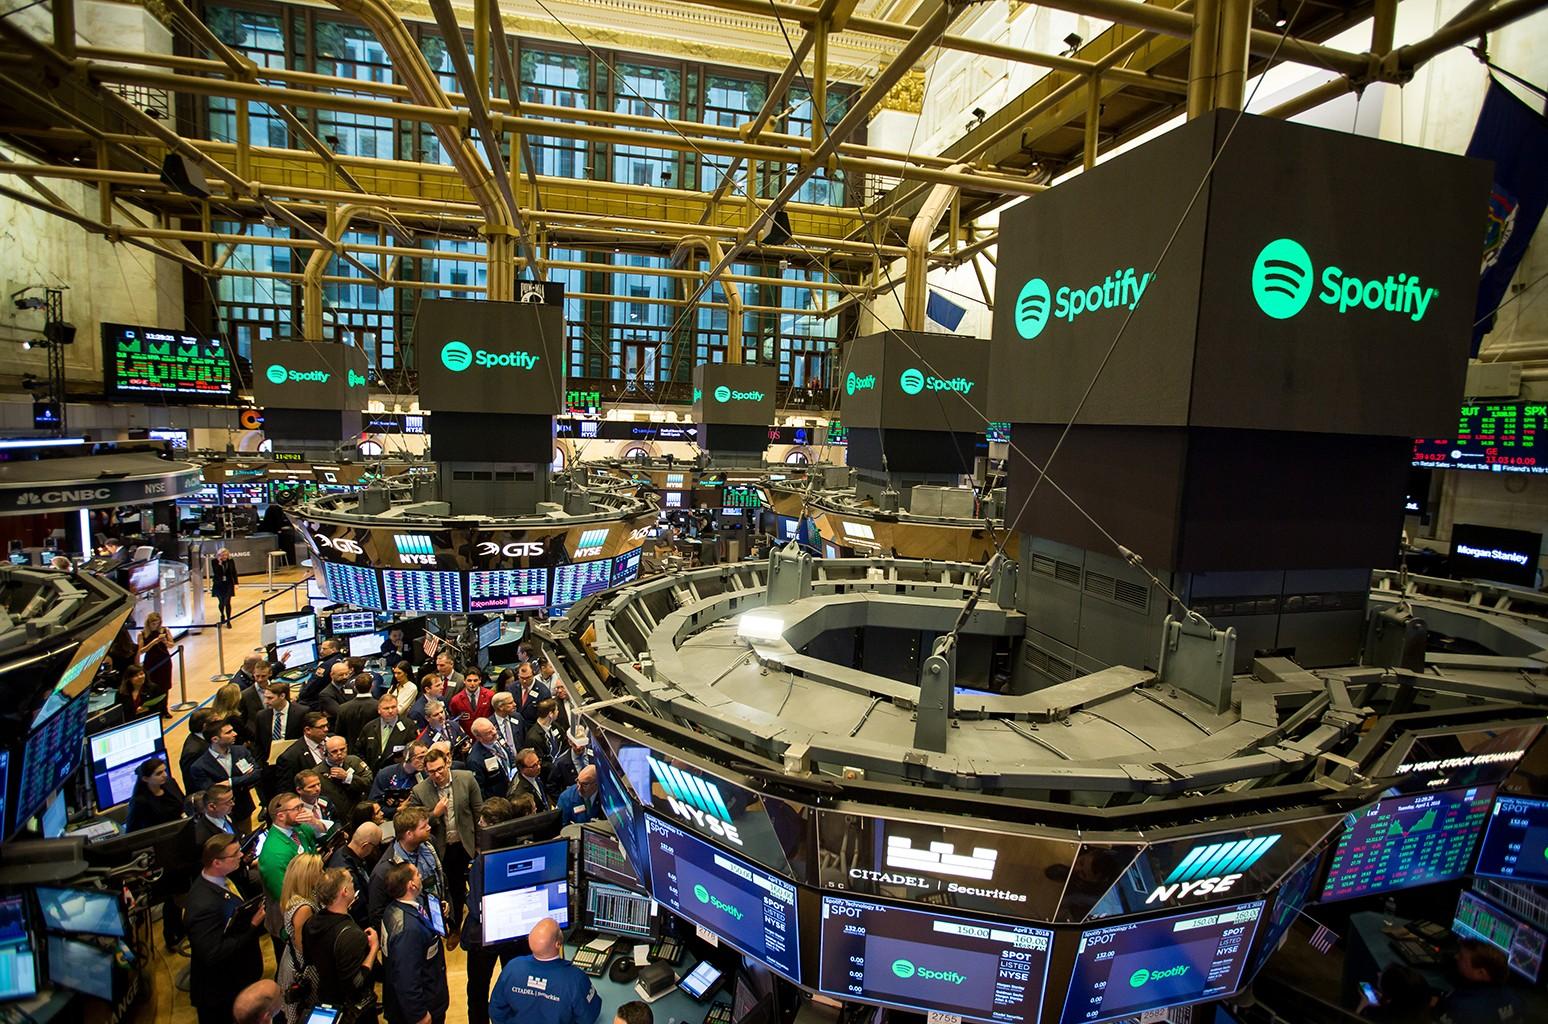 Spotify Stock Exchange